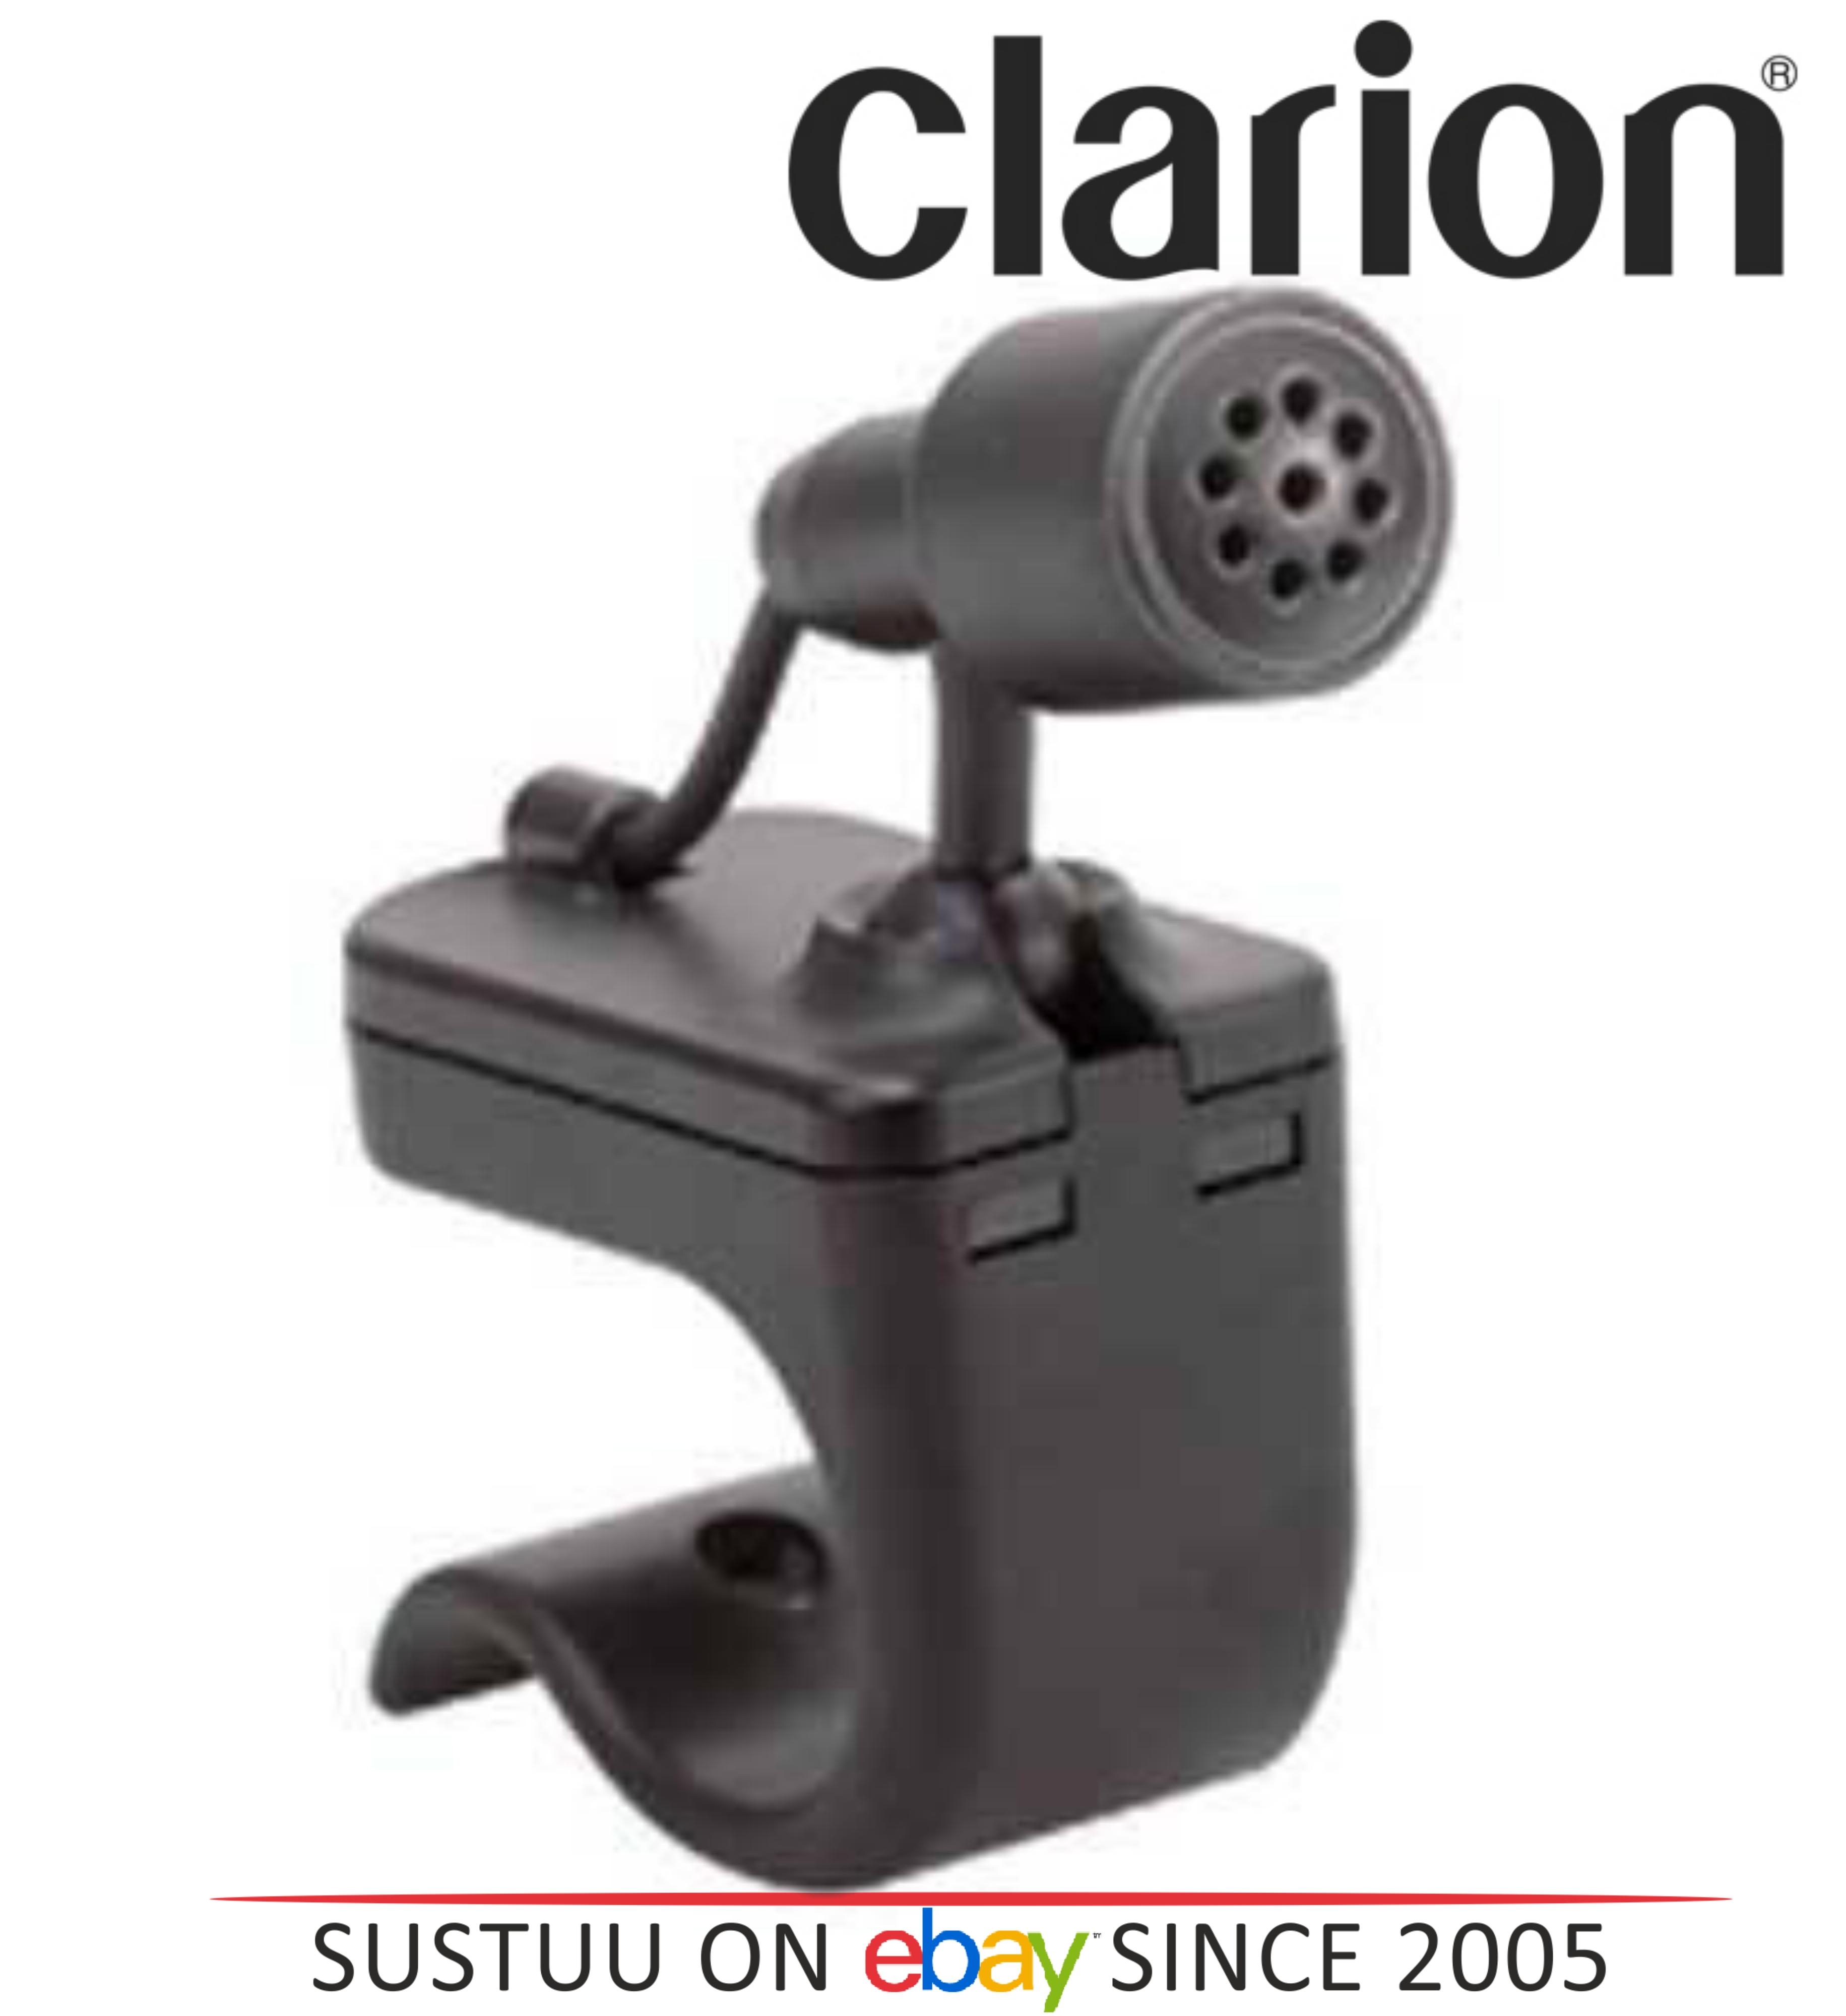 Clarion CGB 1289 Wireless Bluetooth Microphone Mini Jack Black 1YEAR WARRANTY